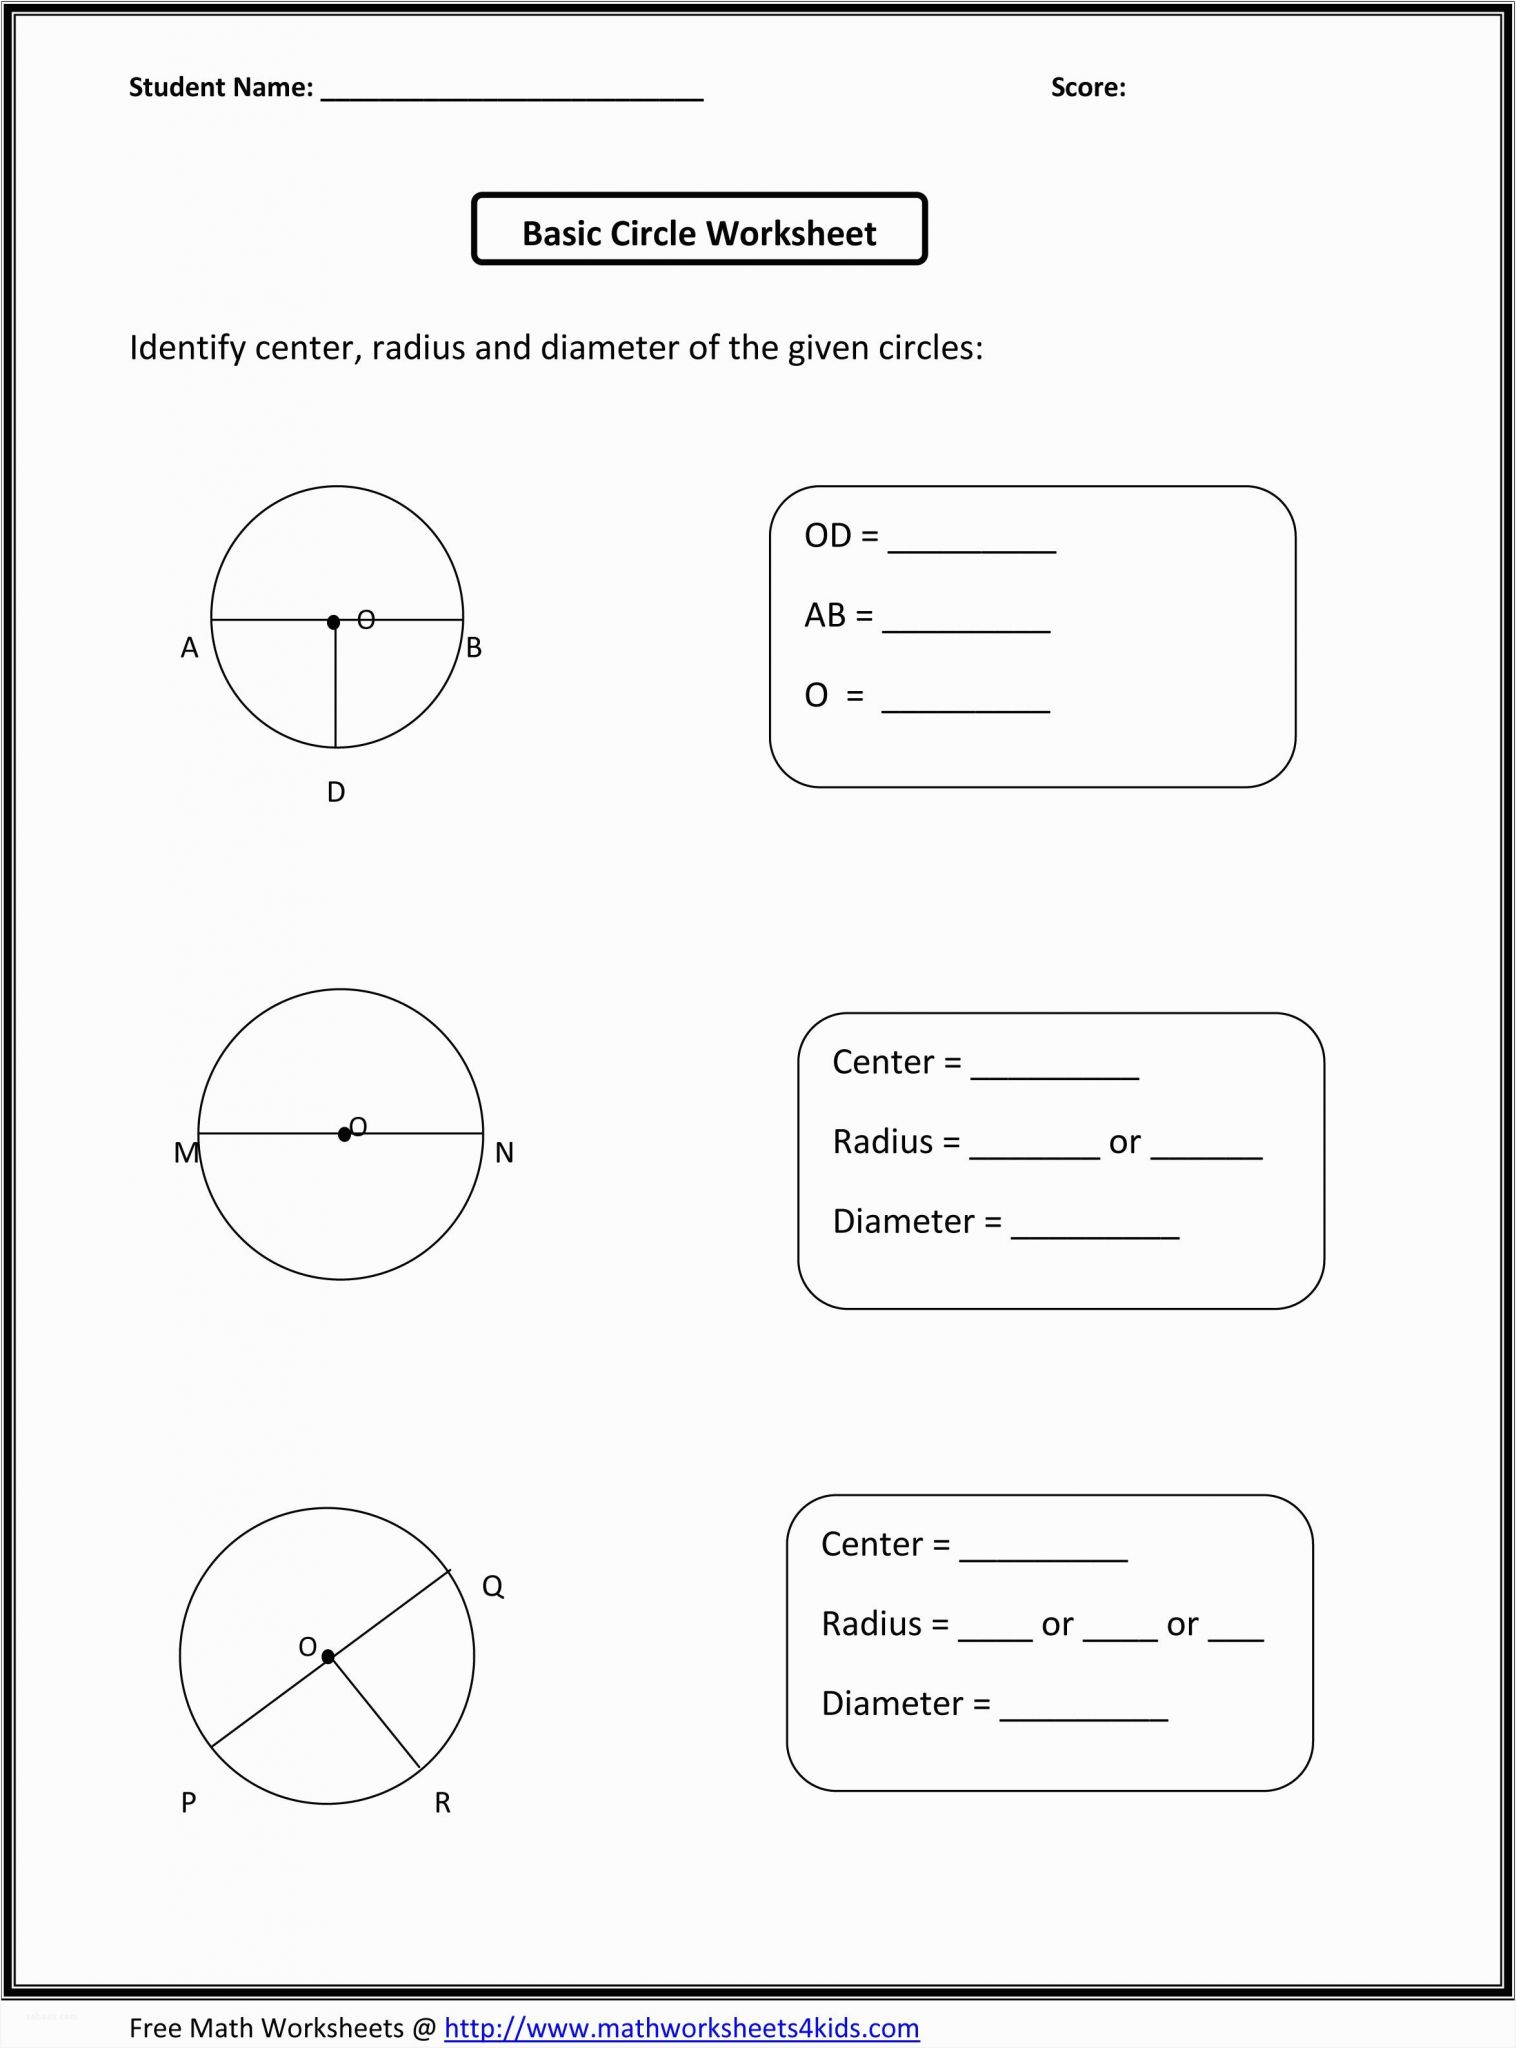 Adding Fractions Worksheets 5th Grade